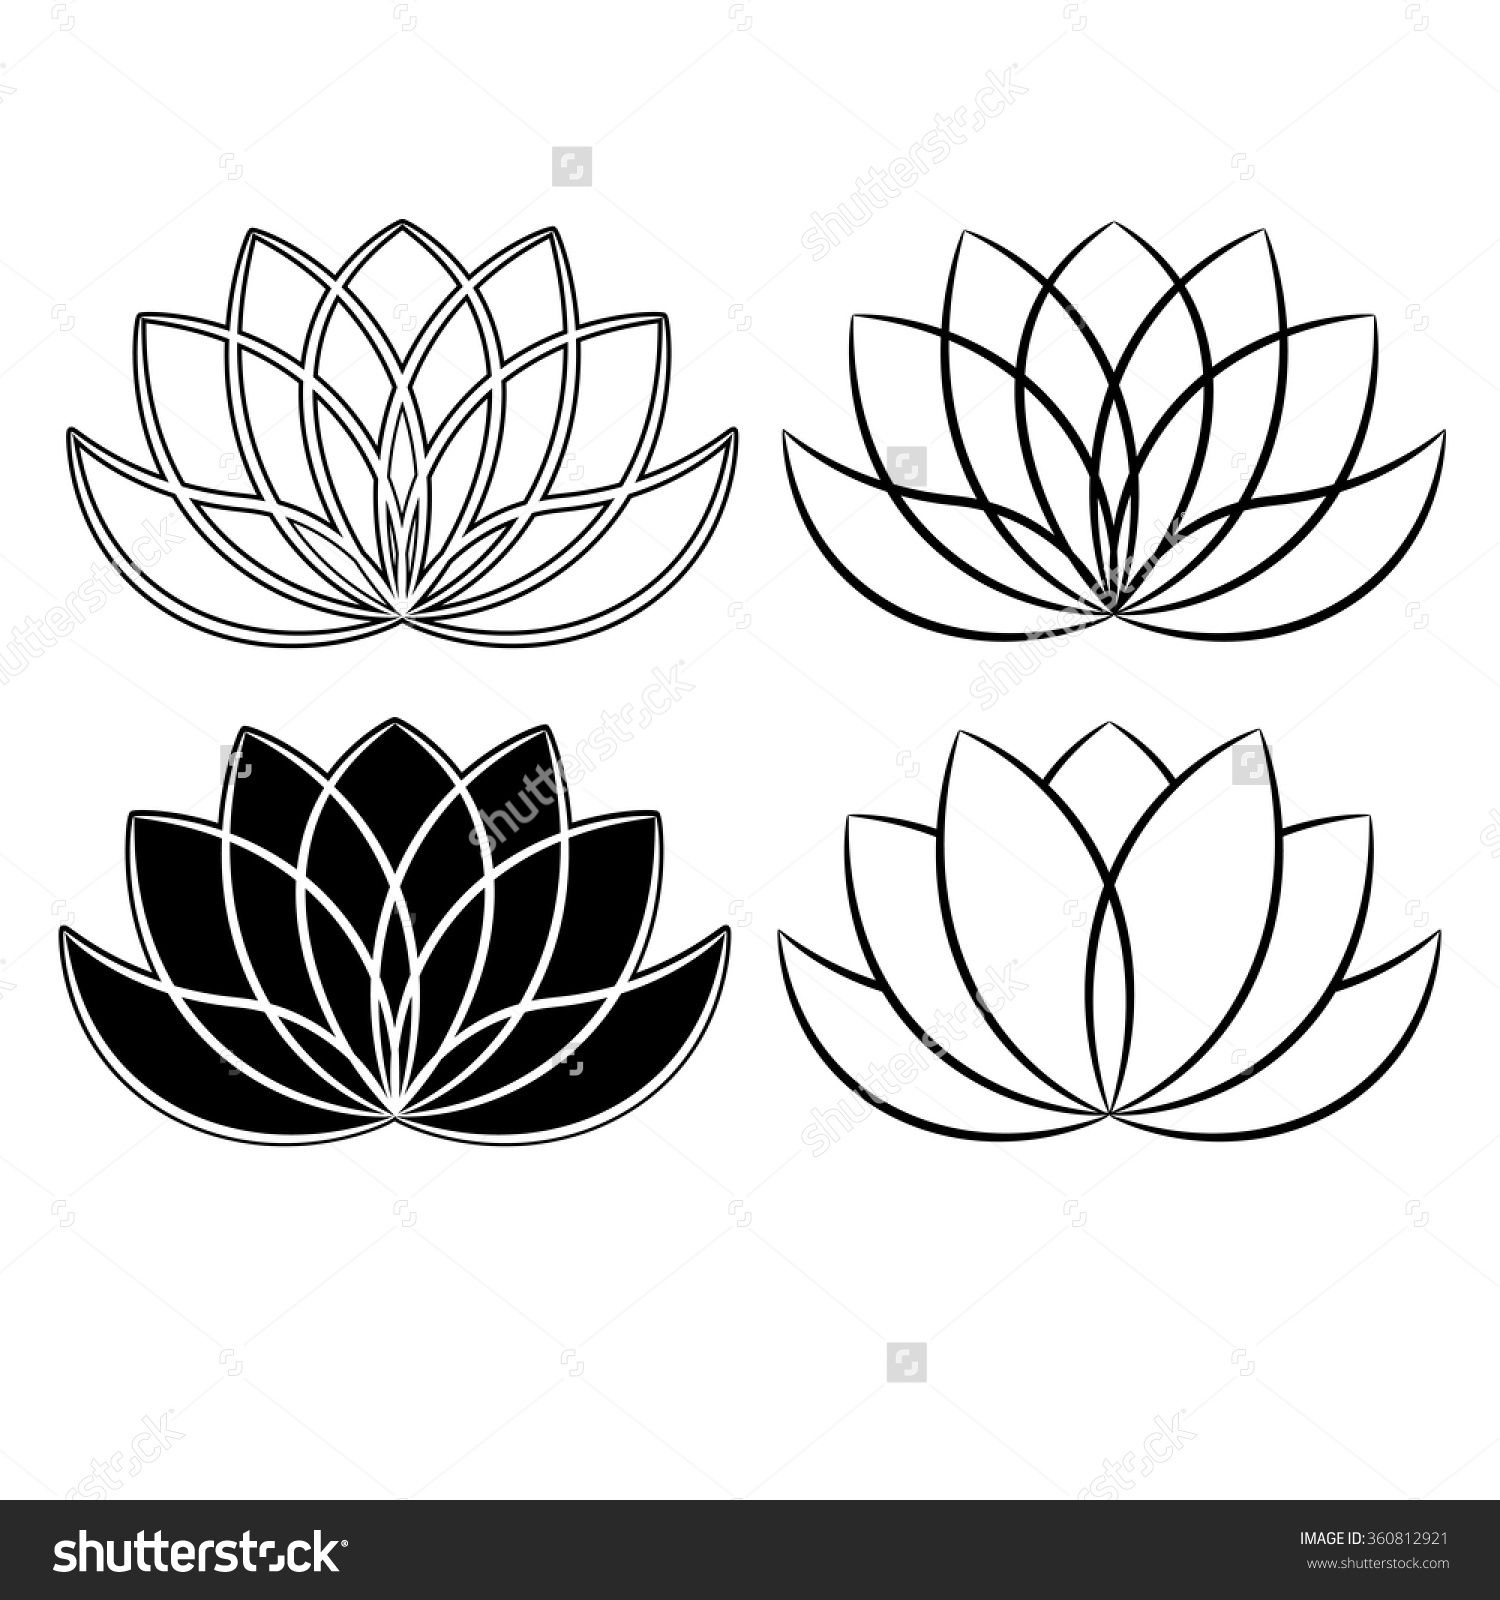 Beautiful lotus flower line illustration. Vector abstract